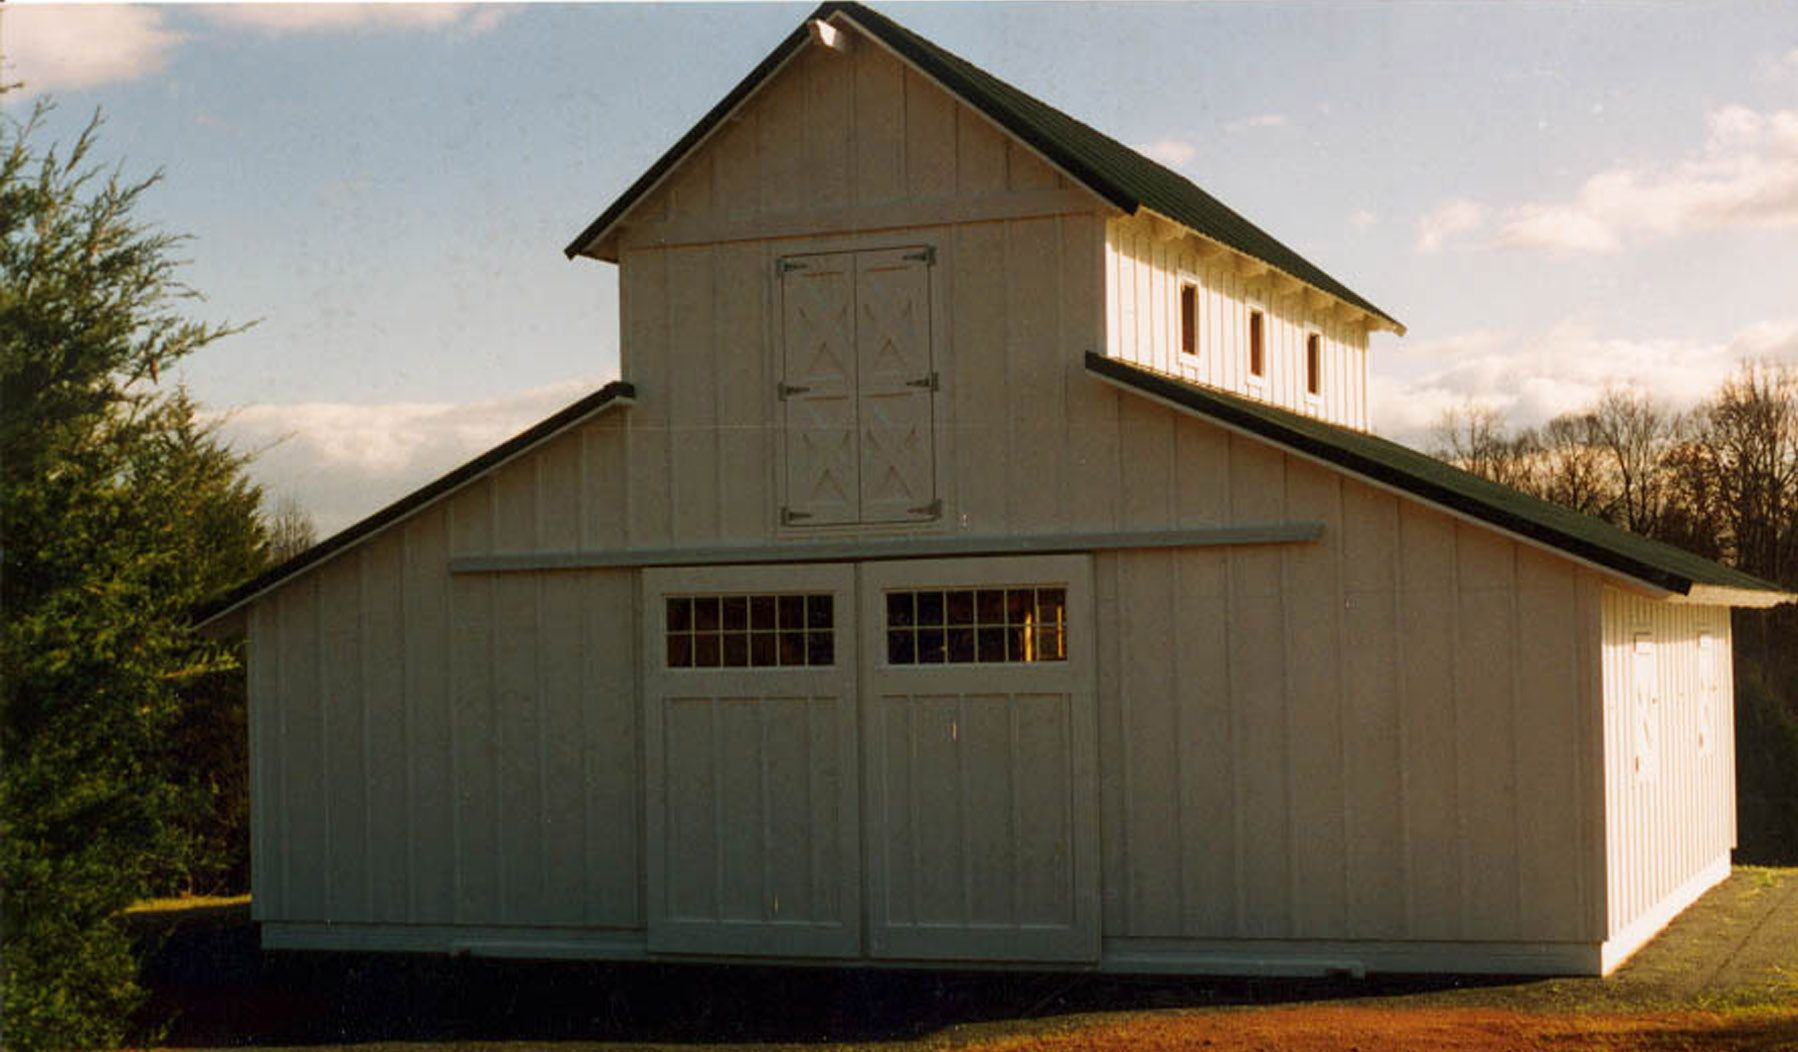 wonderful barn with loft #1: Pinterest